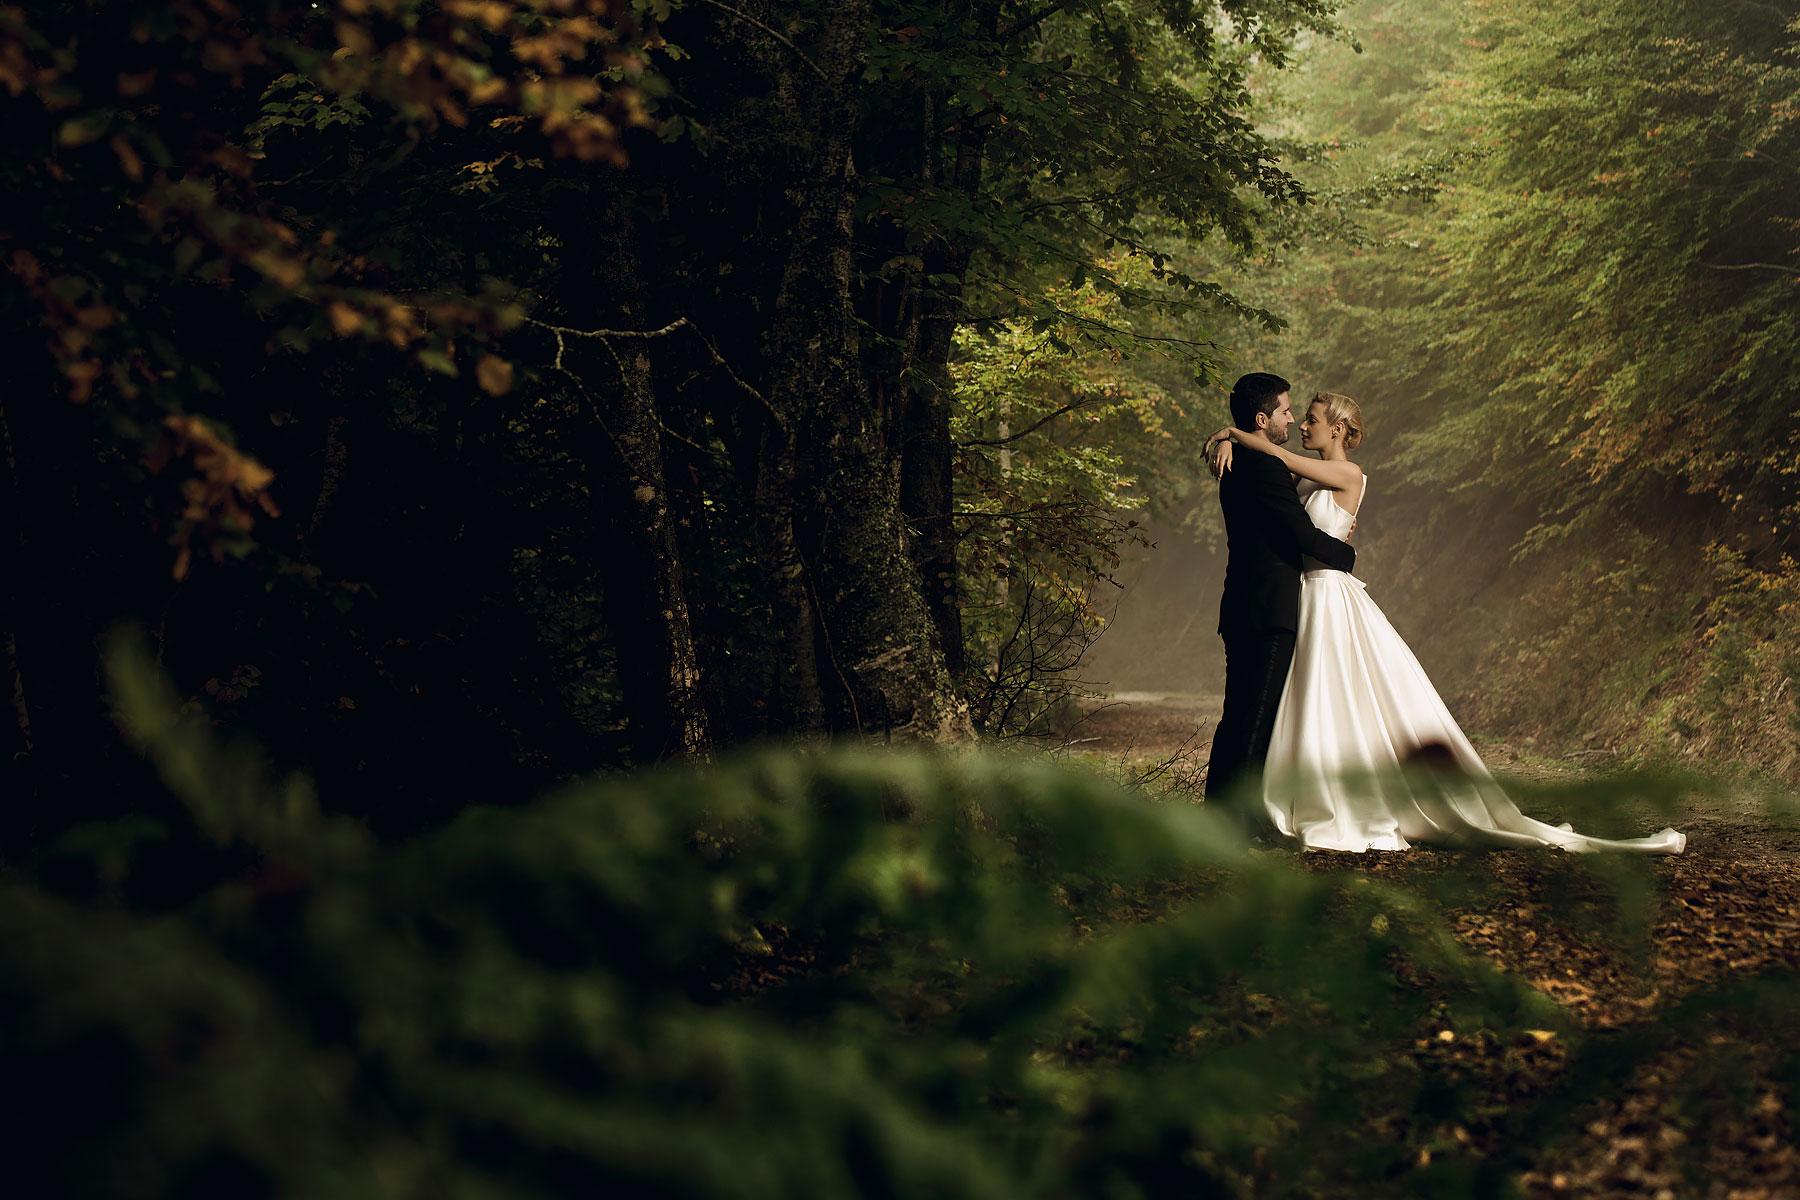 fa40P2photography_wedding_Greece_Kiriakos_Nikolina_3035.jpg